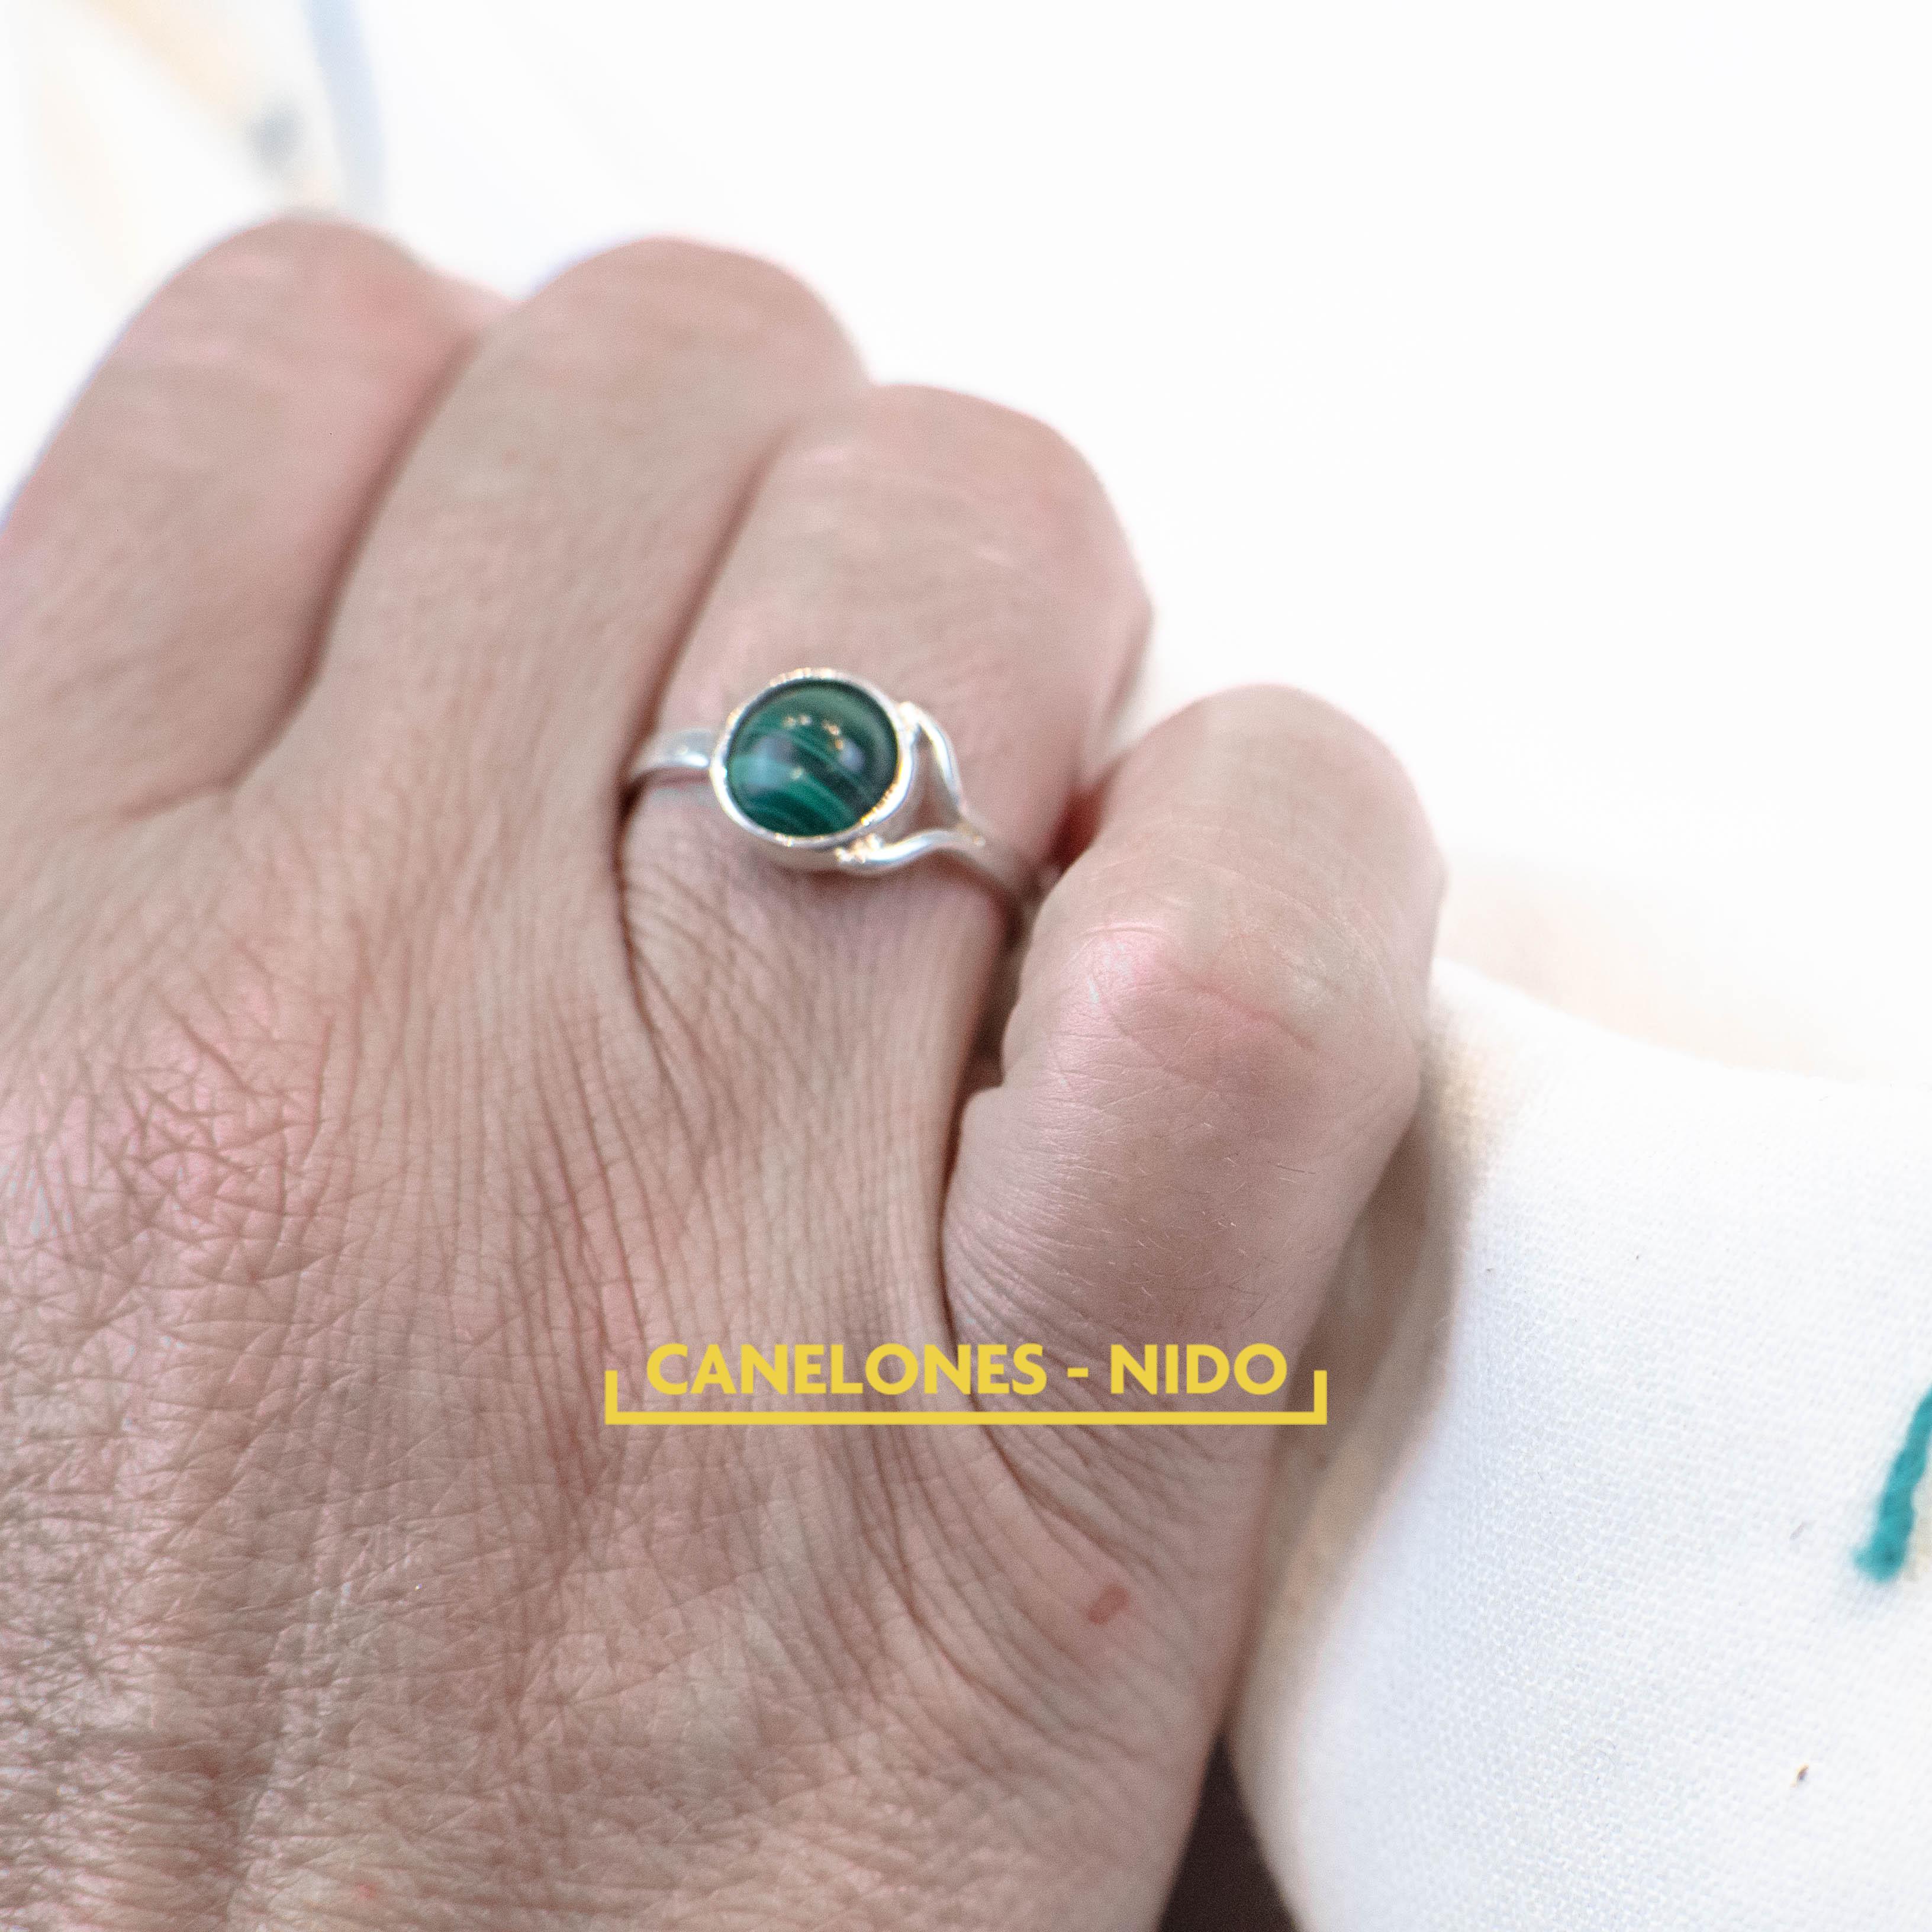 Anillo en plata con piedra Malaquita